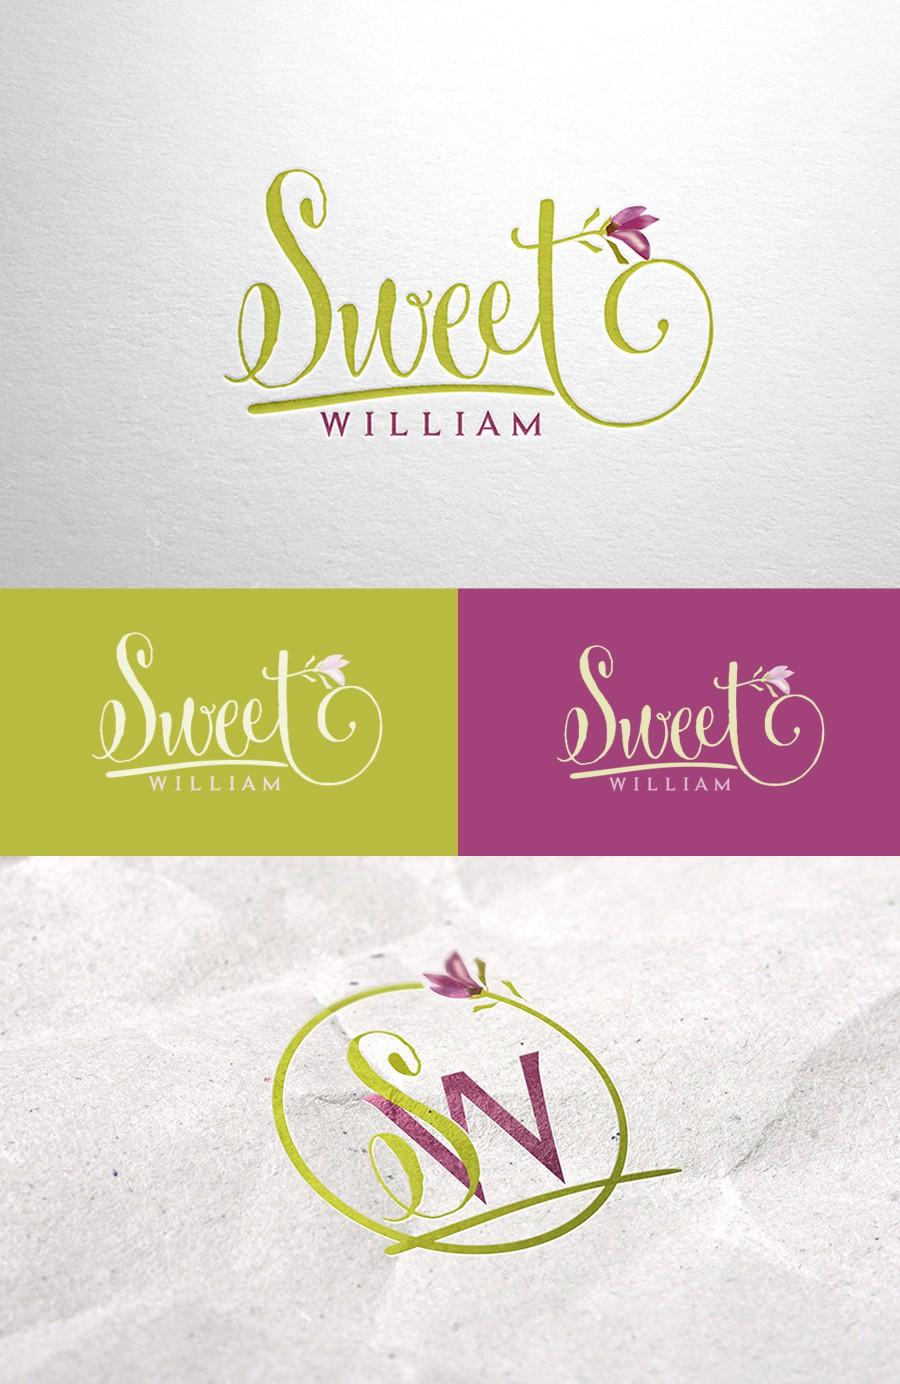 Elegant logo for Sweet William, a flower bulb business